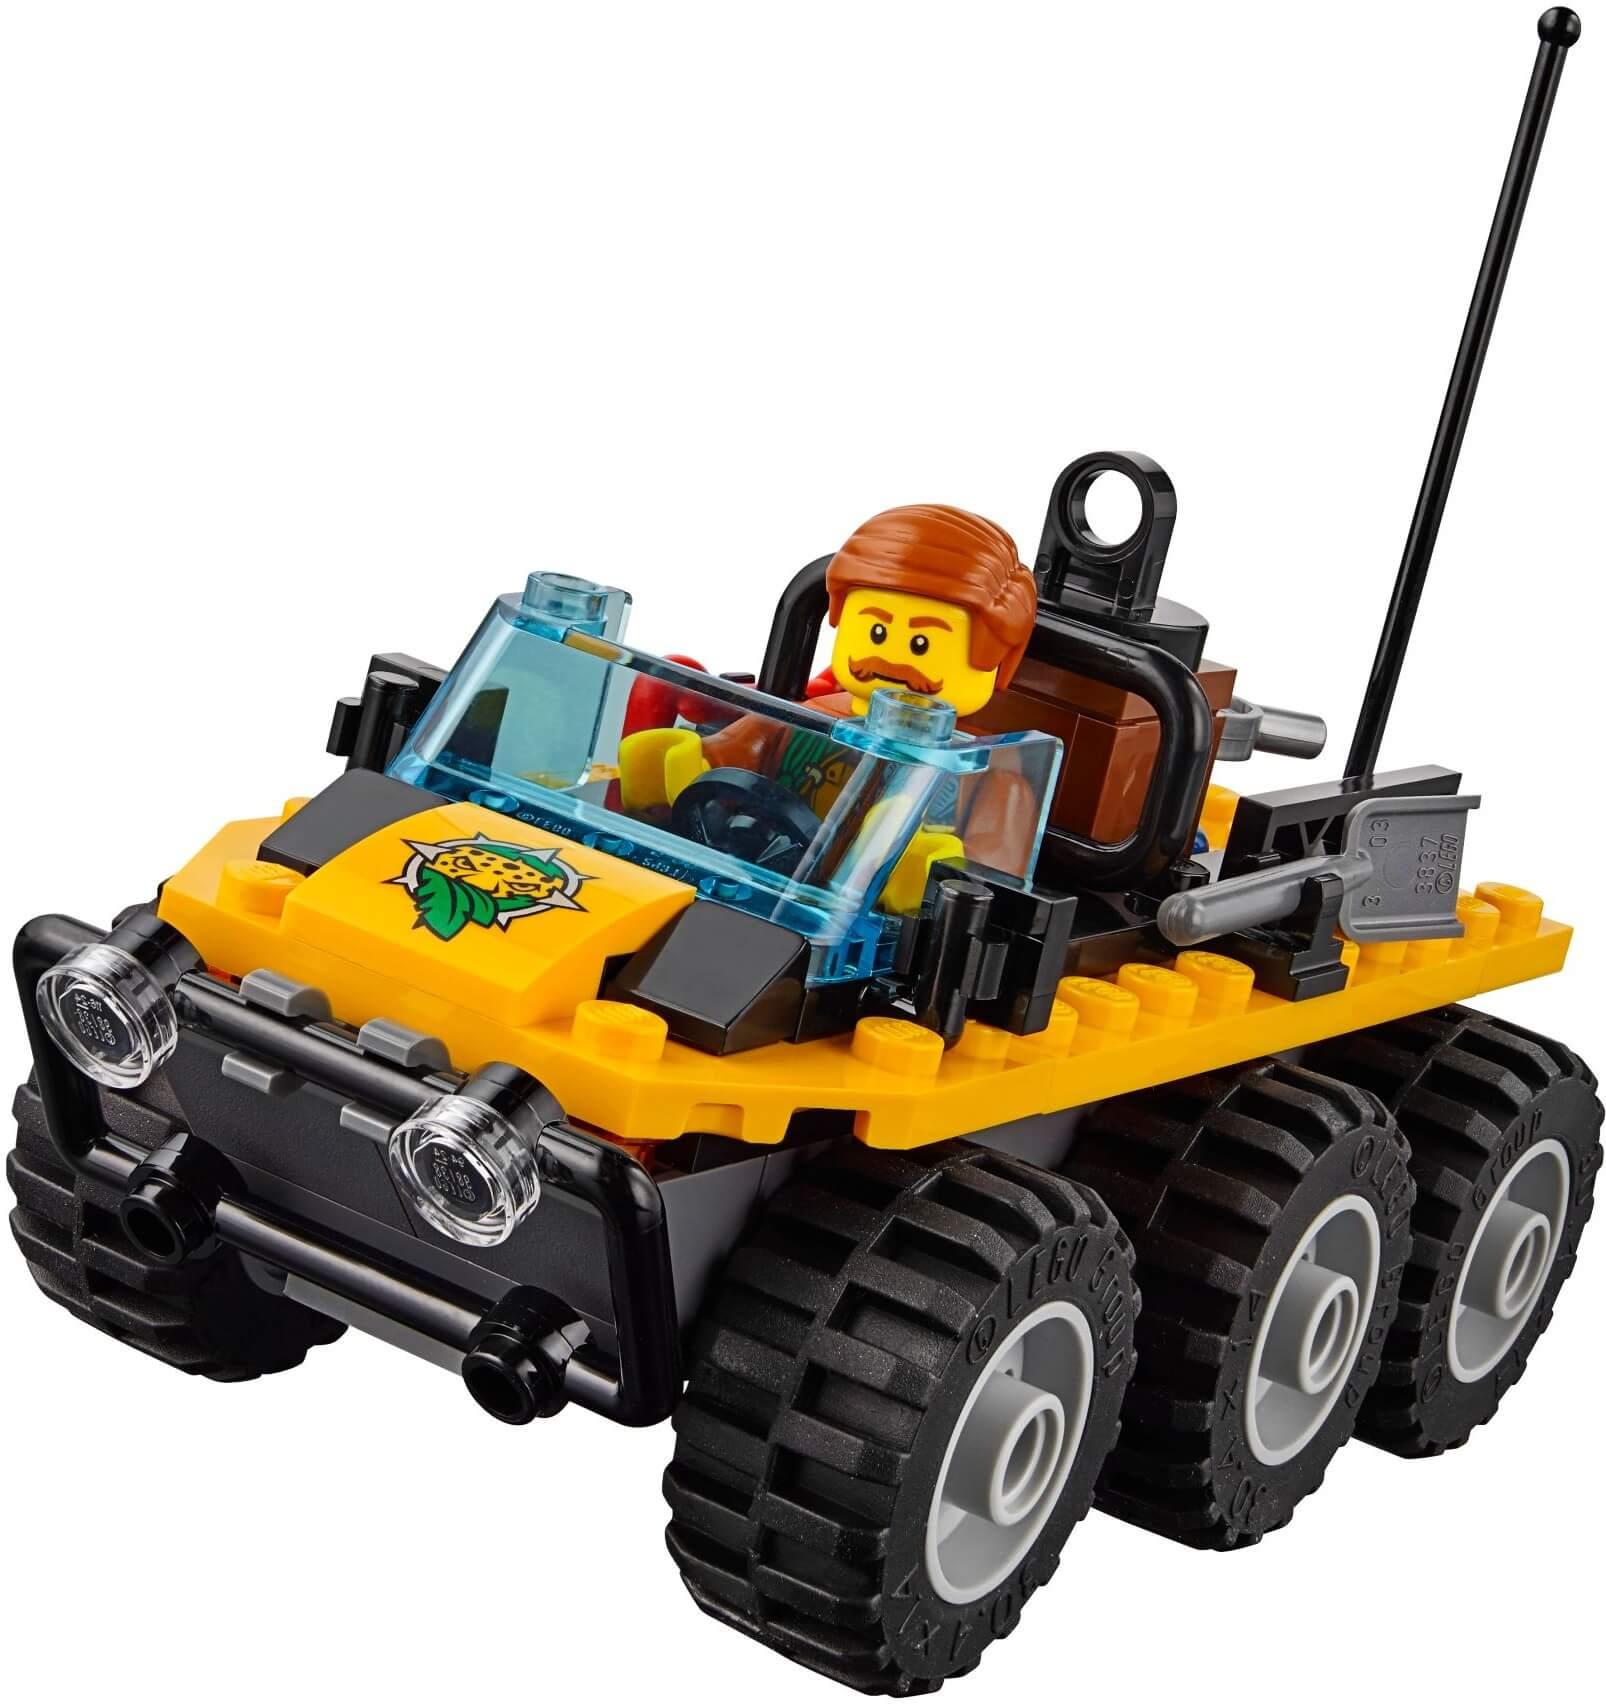 Mua đồ chơi LEGO 60161 - LEGO City 60161 - Biệt Đội Thám Hiểm Rừng (LEGO City Jungle Explorers Jungle Exploration Site)